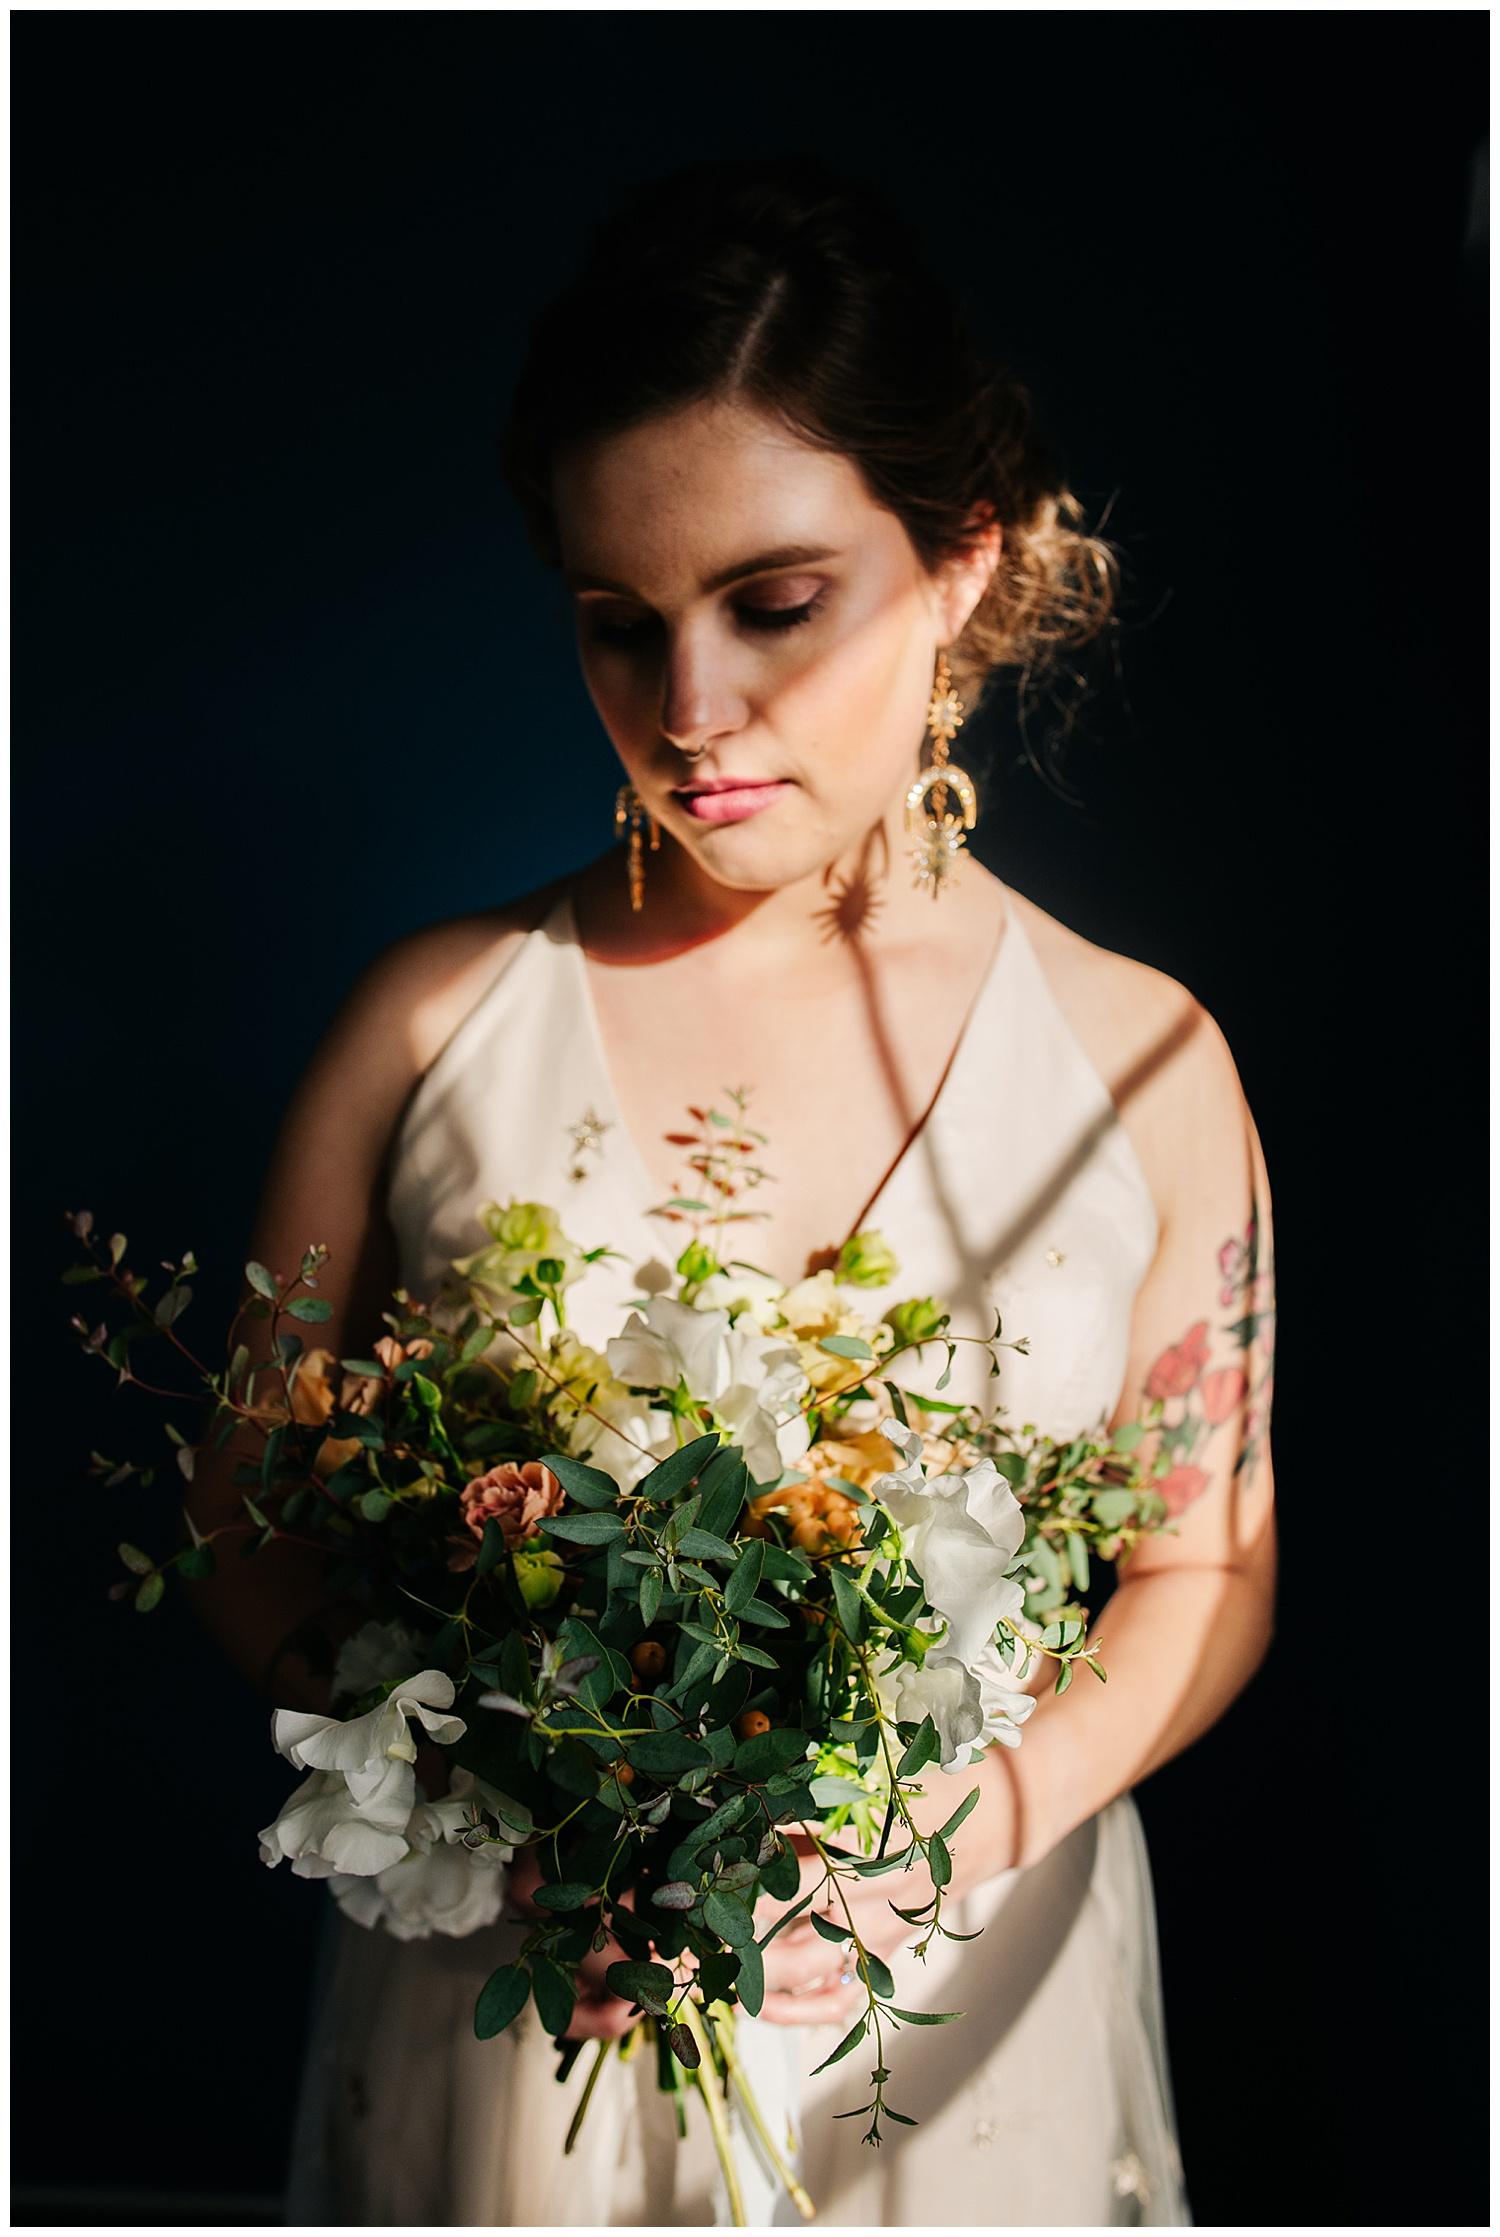 SamEricaStudios - San Diego Wedding Photographer - Galaxy Themed Rainy Day Wedding Parq West San Diego_0032.jpg